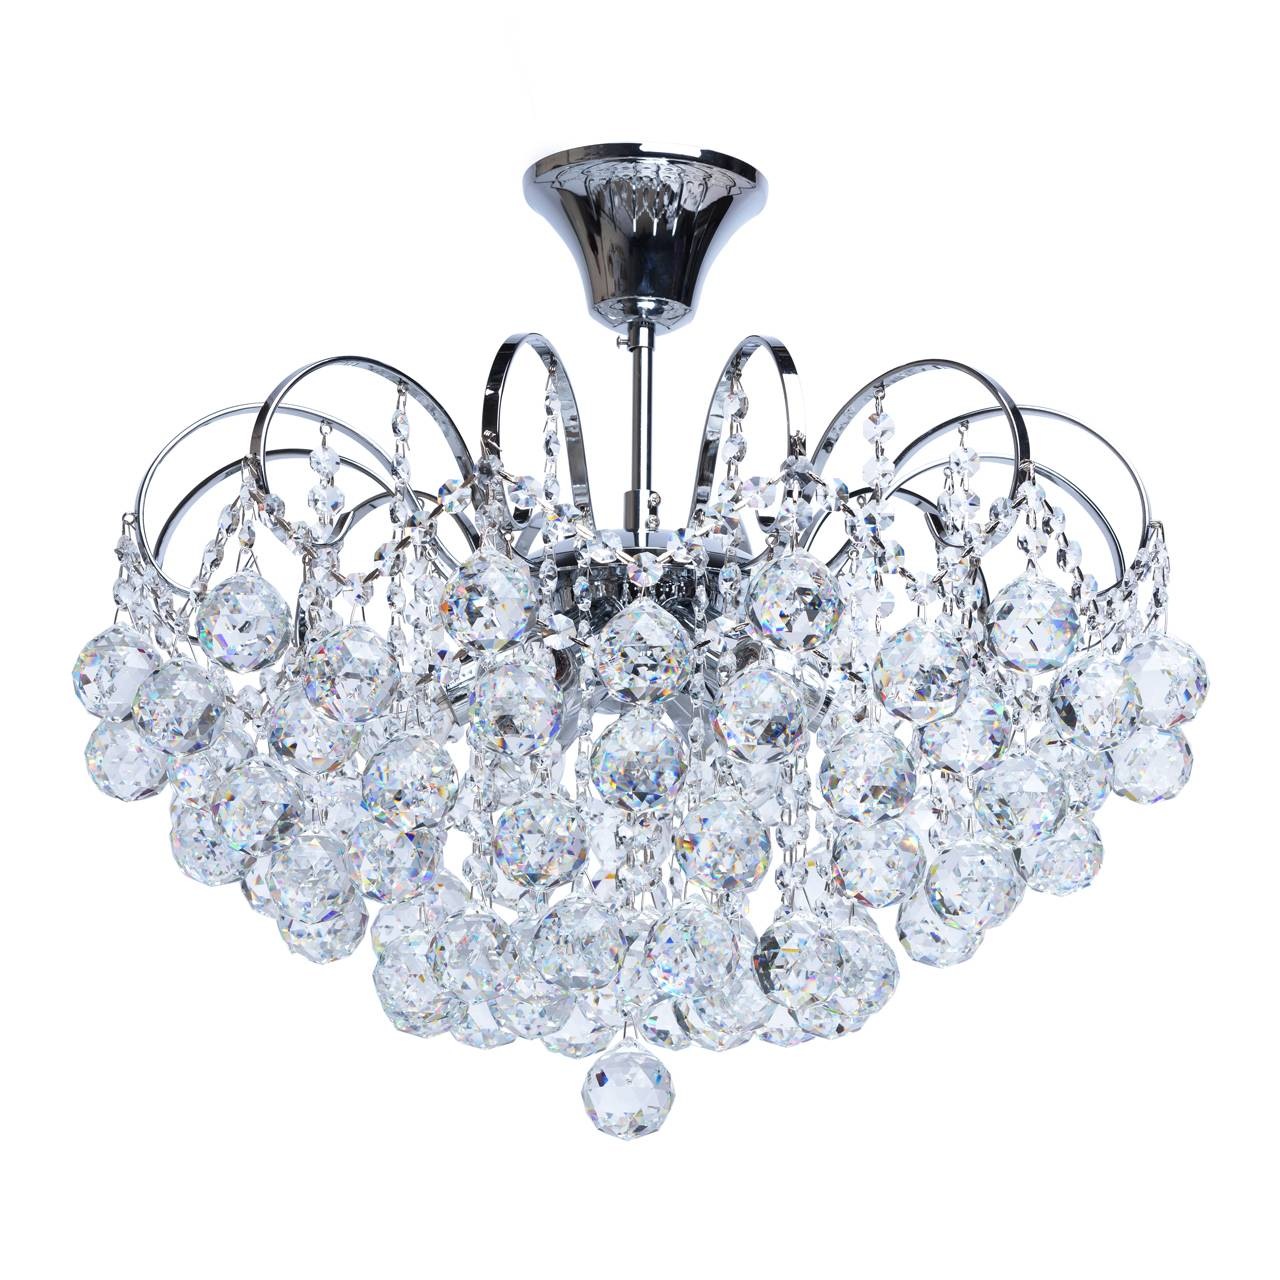 цена на Потолочная люстра MW-Light Жемчуг 232017506